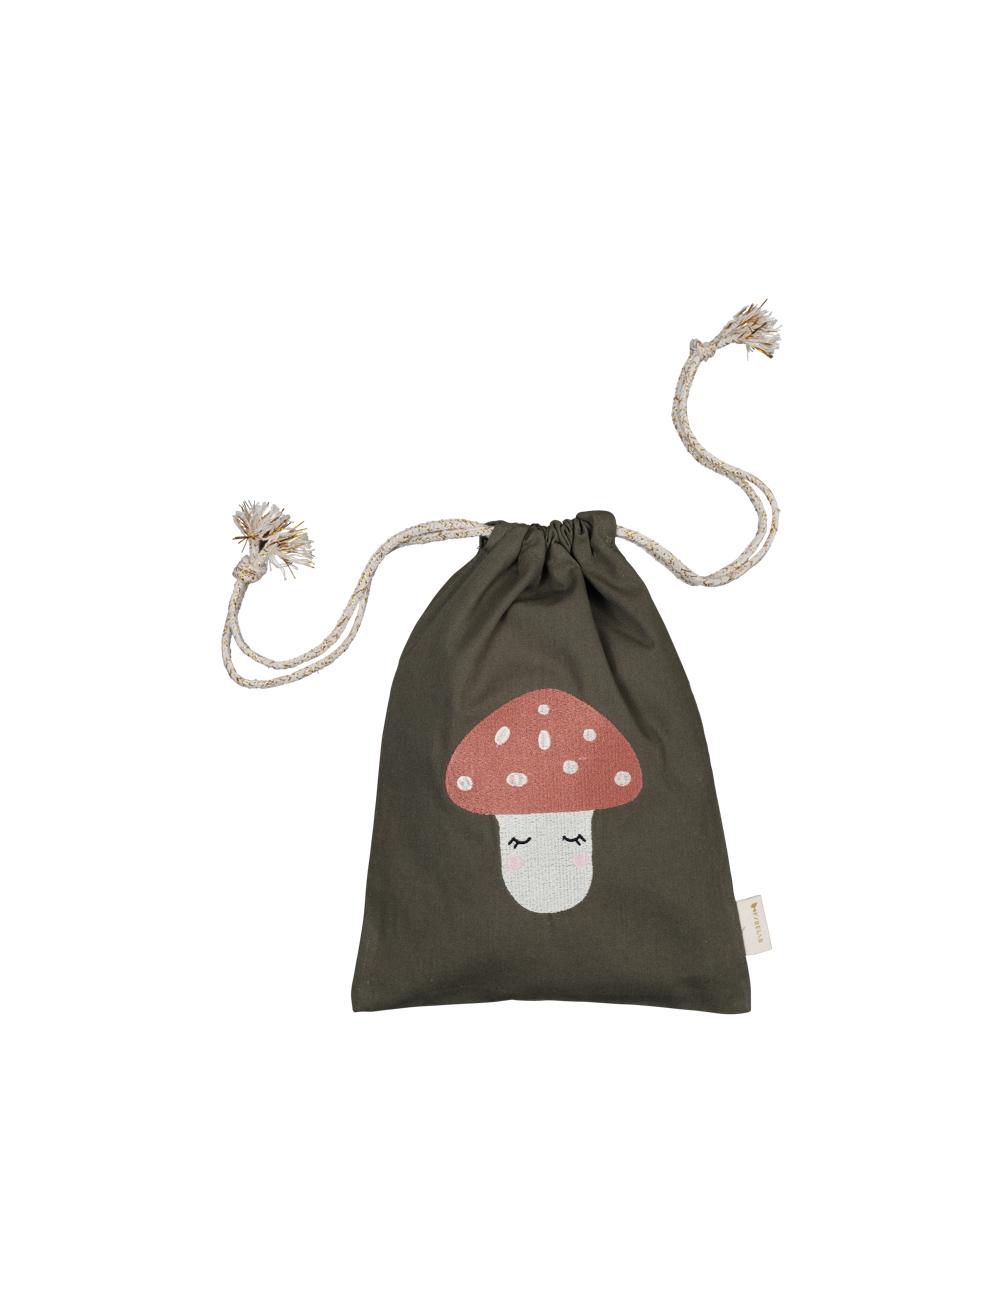 Mushroom Gift Bag